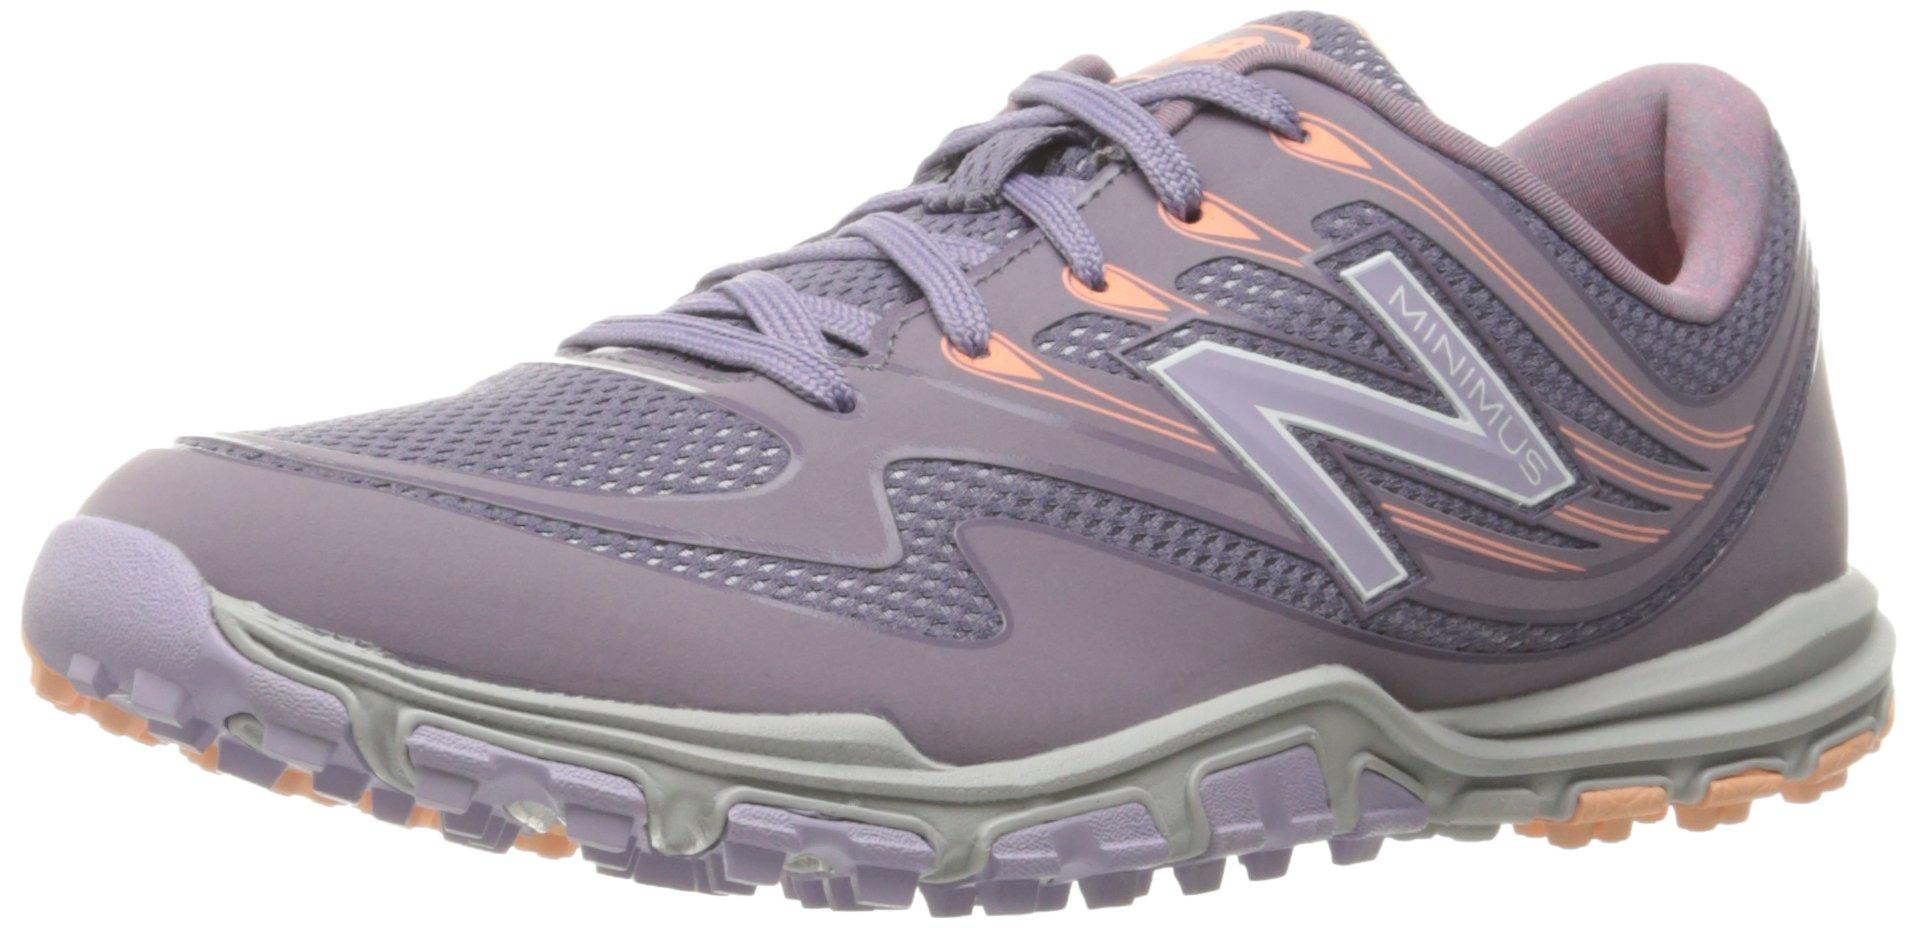 New Balance Women's nbgw1006 Golf Shoe, Purple, 10 B US